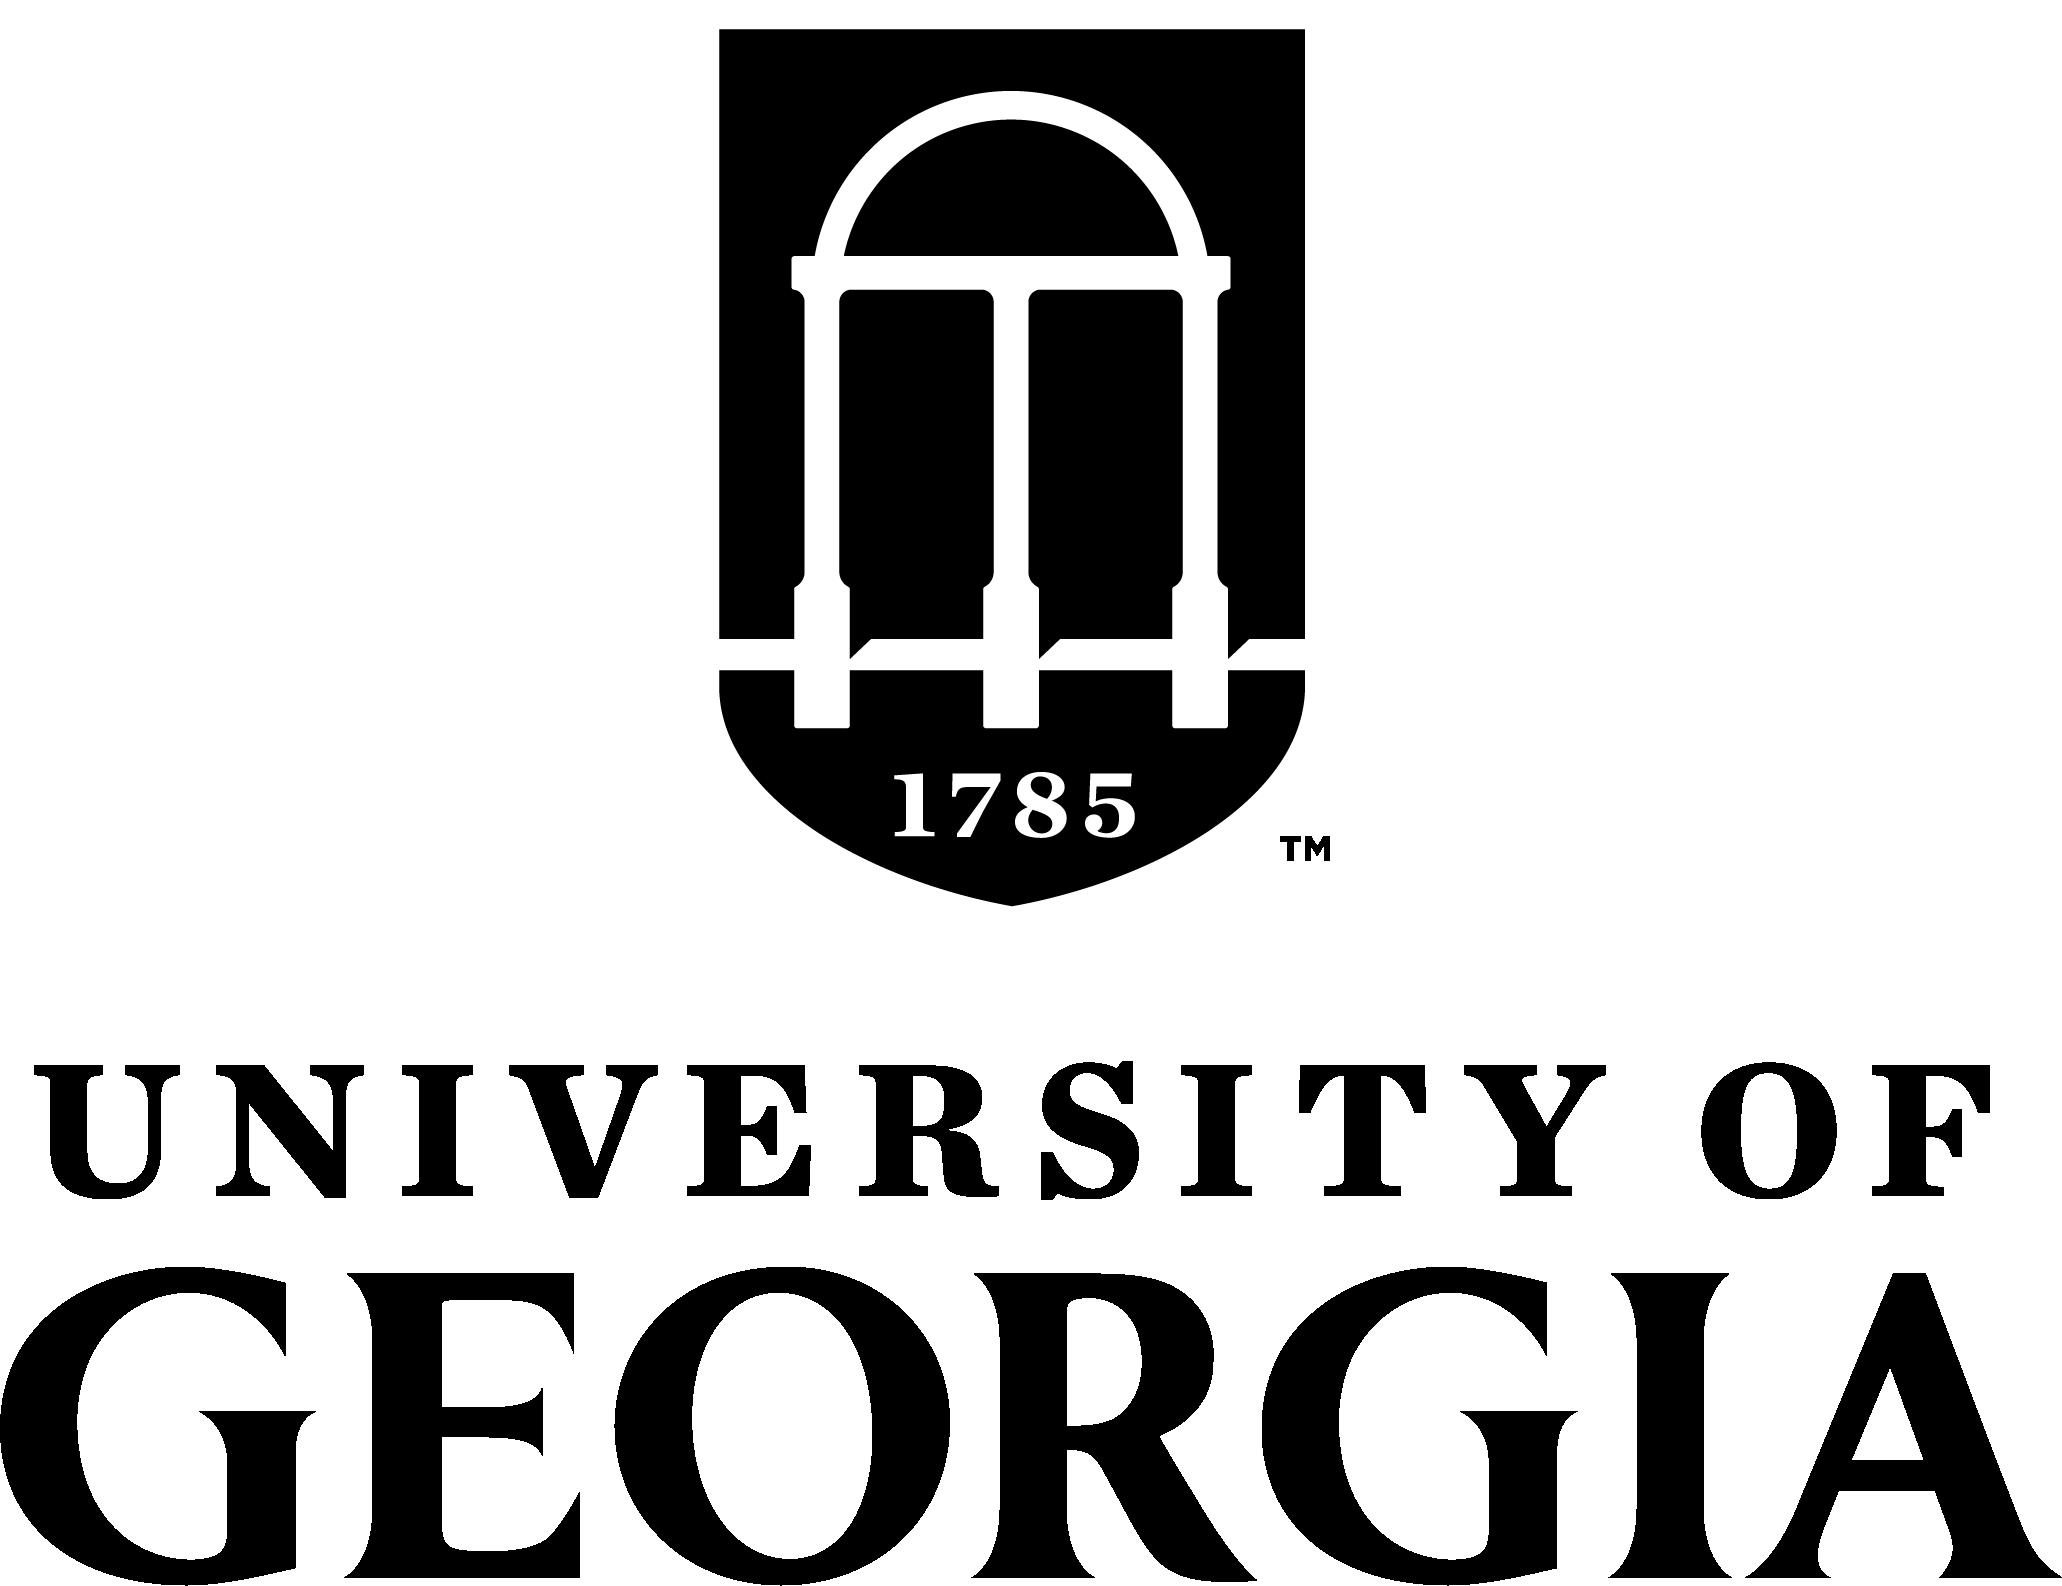 University logos and marks. Georgia clipart ga state